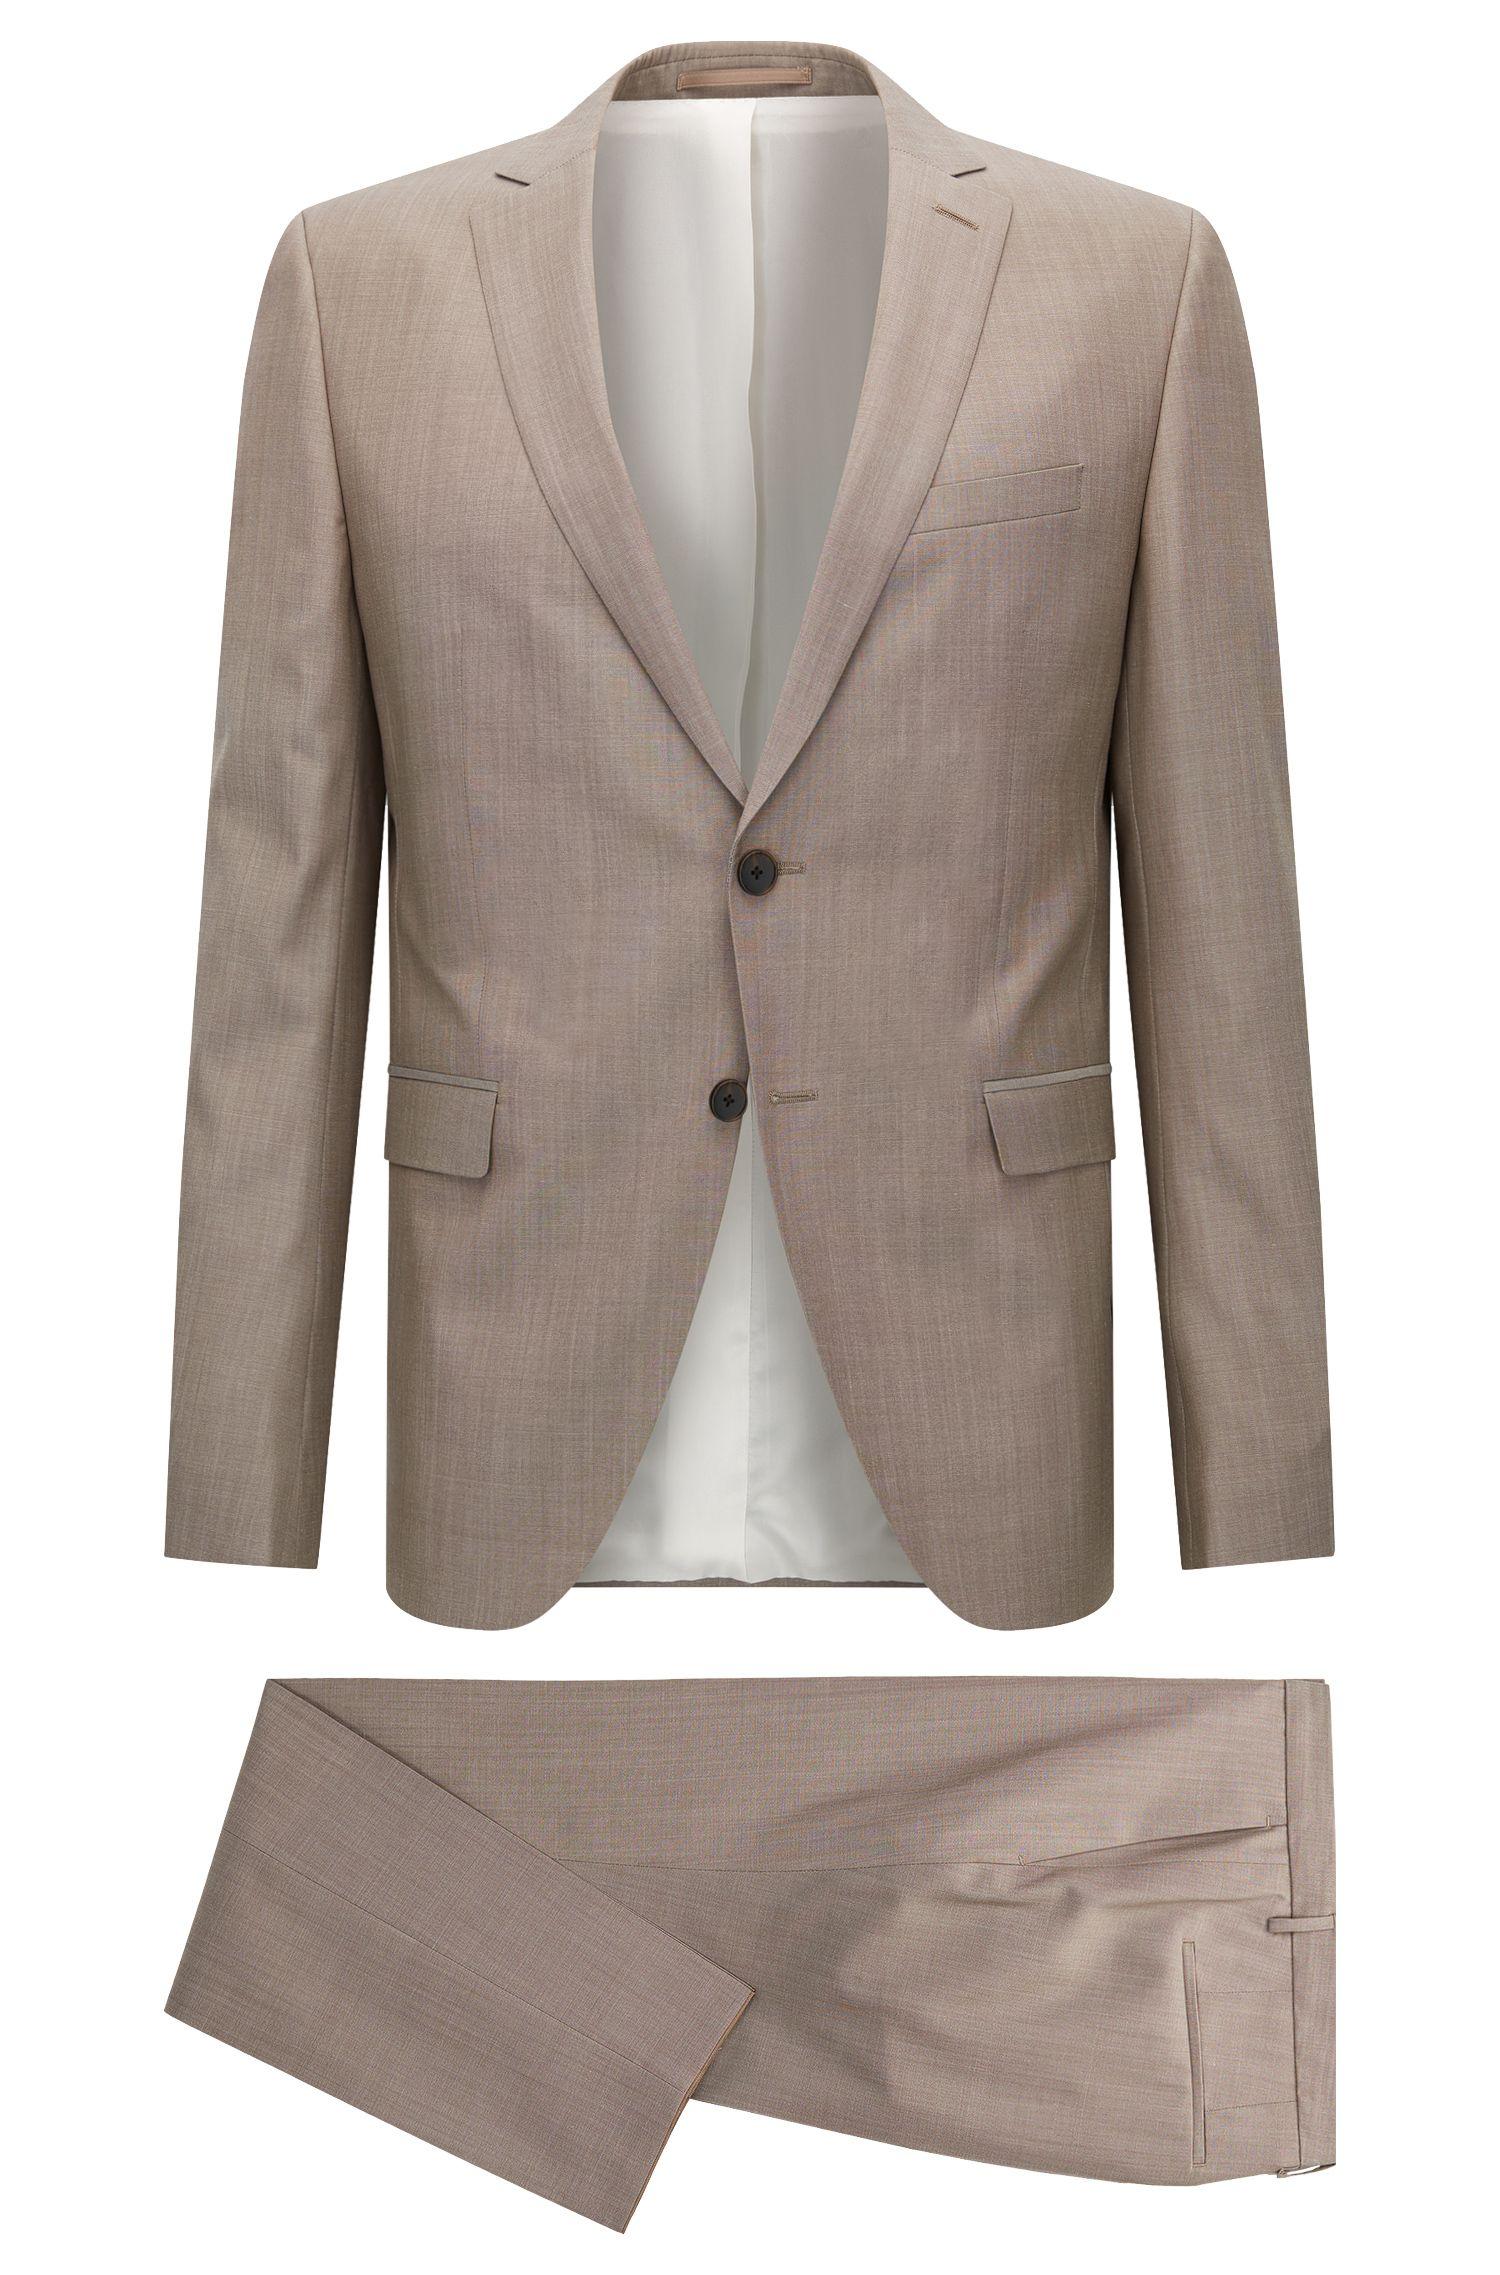 Heathered Virgin Wool Suit, Extra Slim Fit | Reymond/Wenton